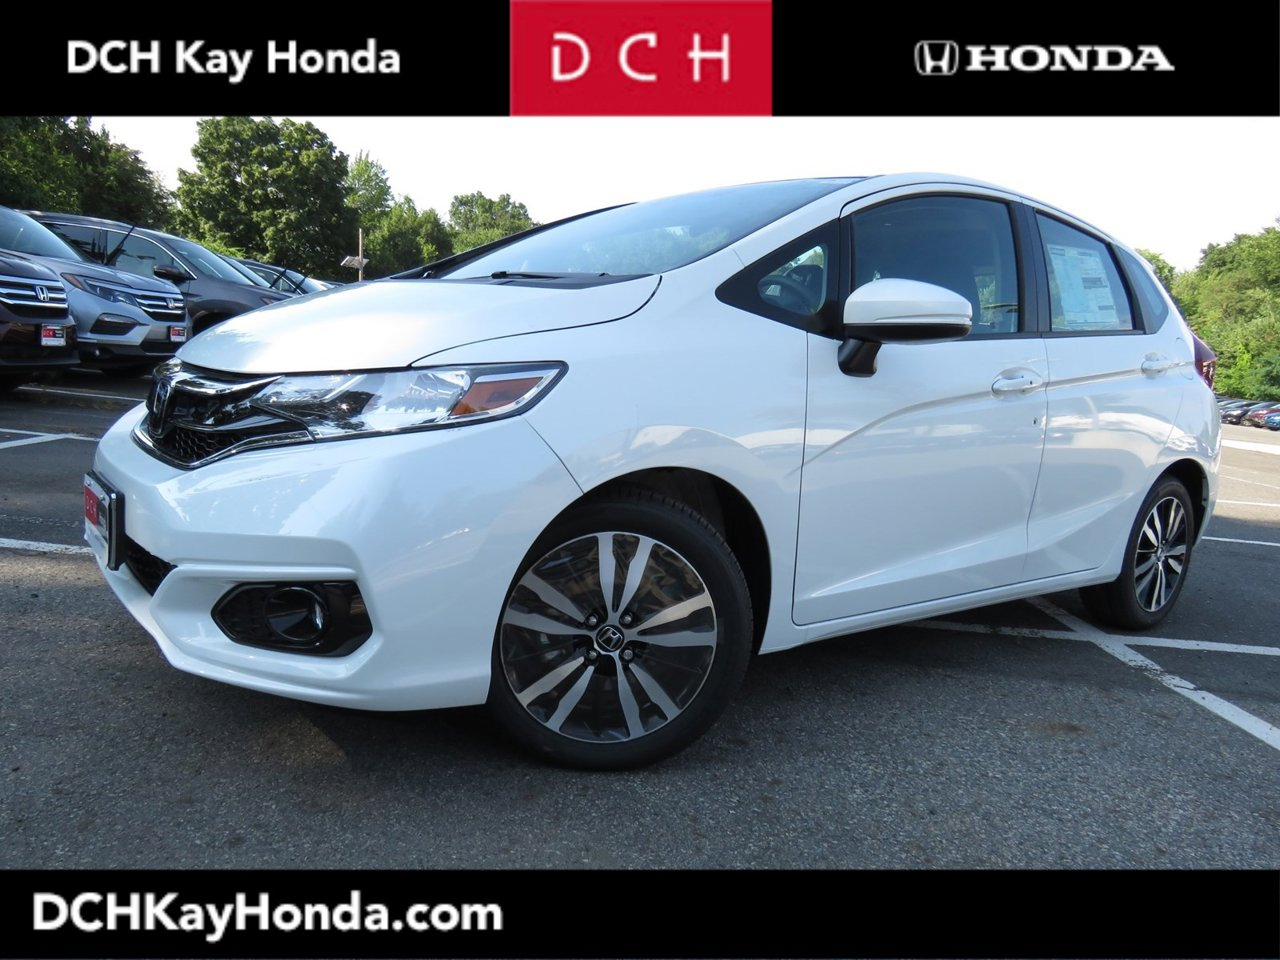 New 2020 Honda Fit in Eatontown, NJ